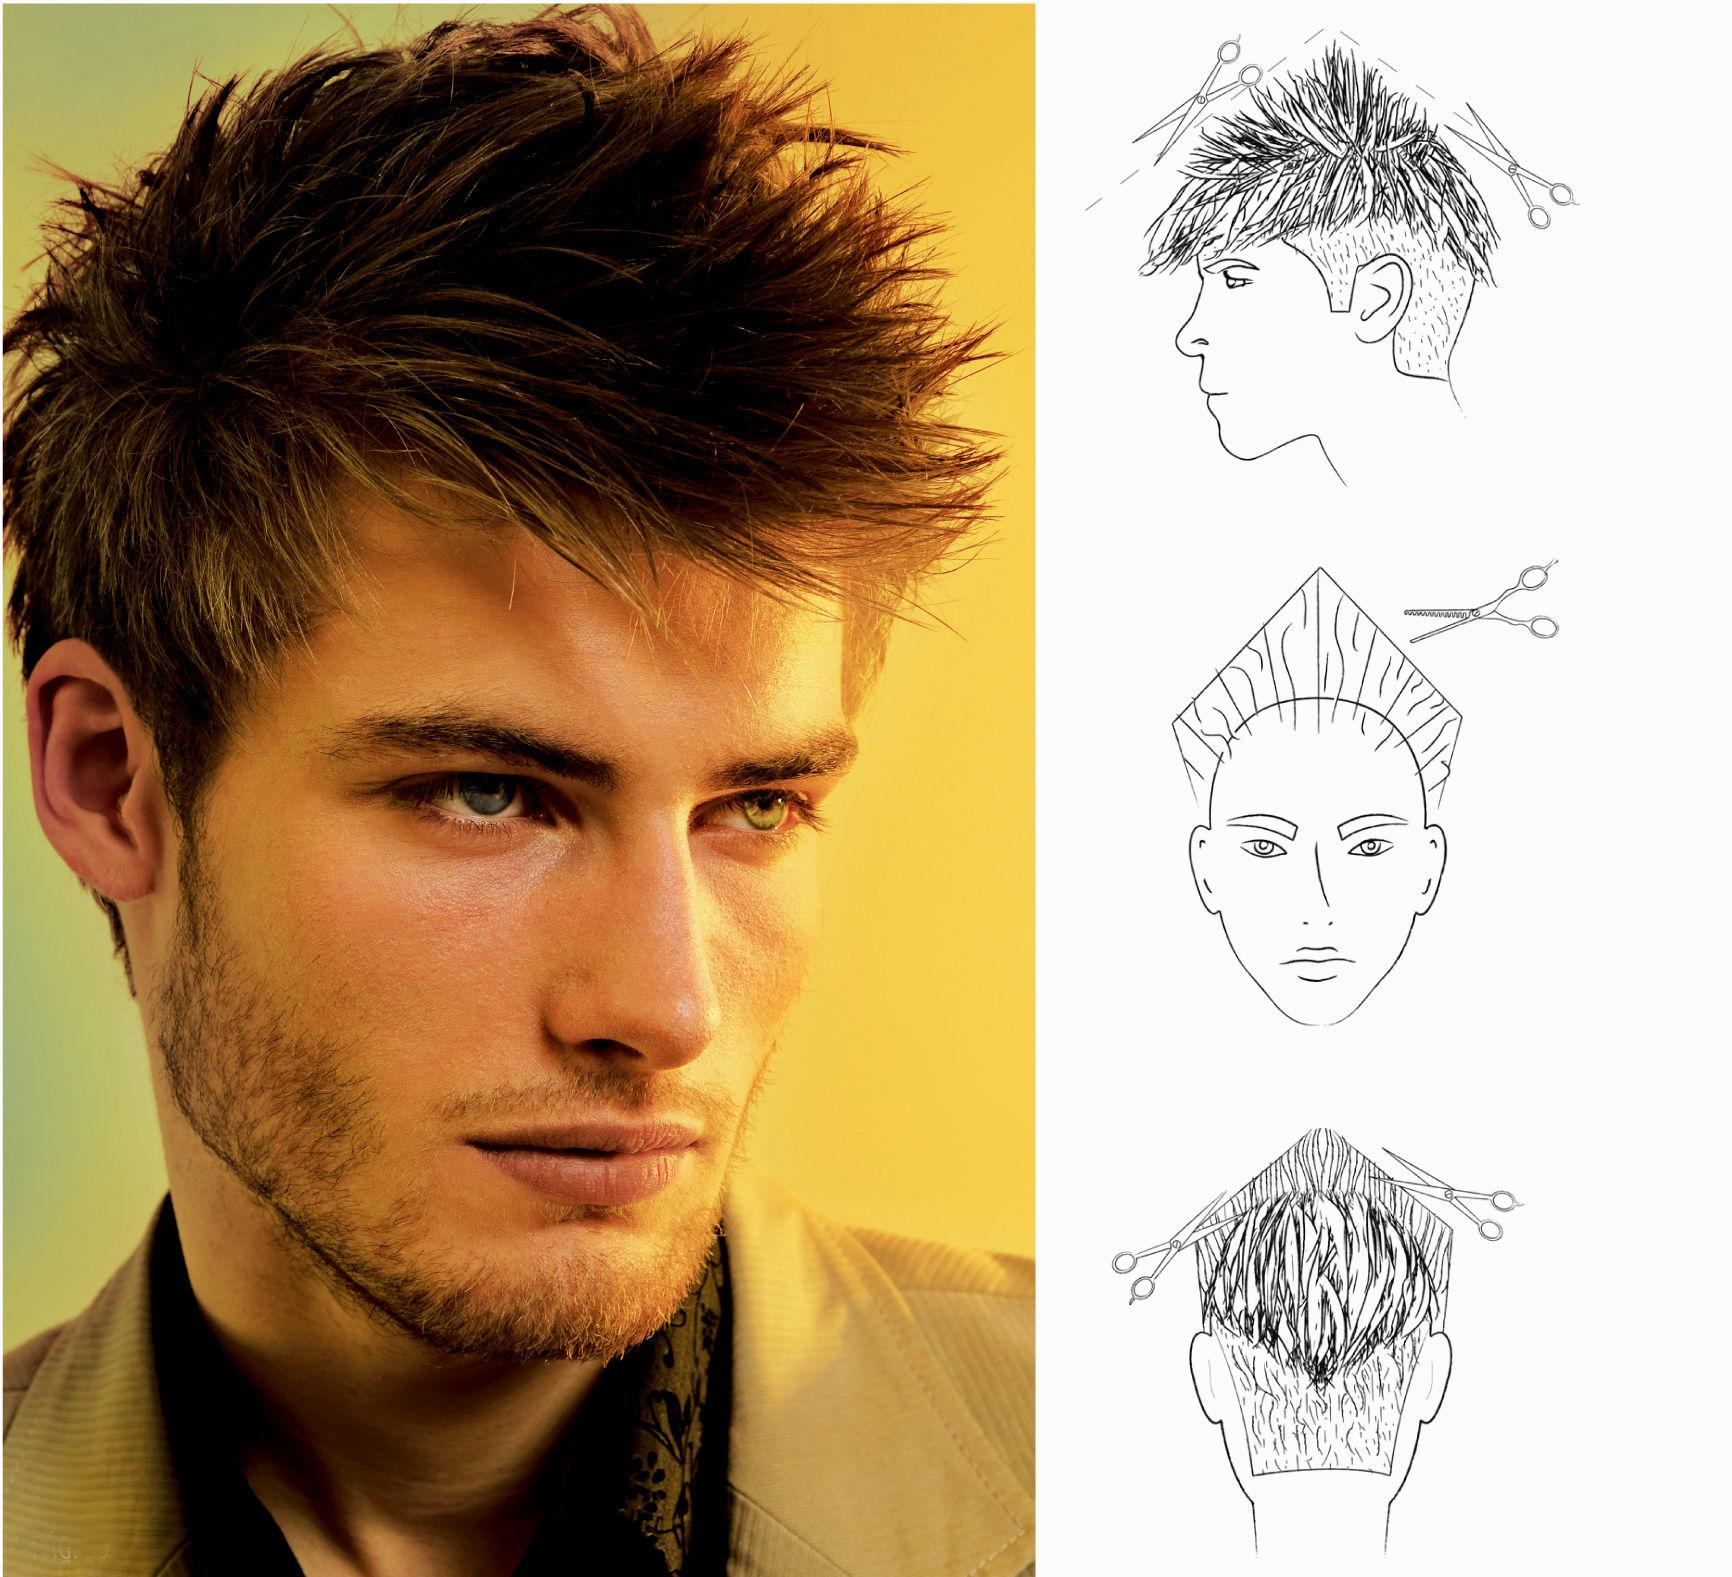 new como cortar o cabelo masculino foto-Beautiful Como Cortar O Cabelo Masculino Galeria